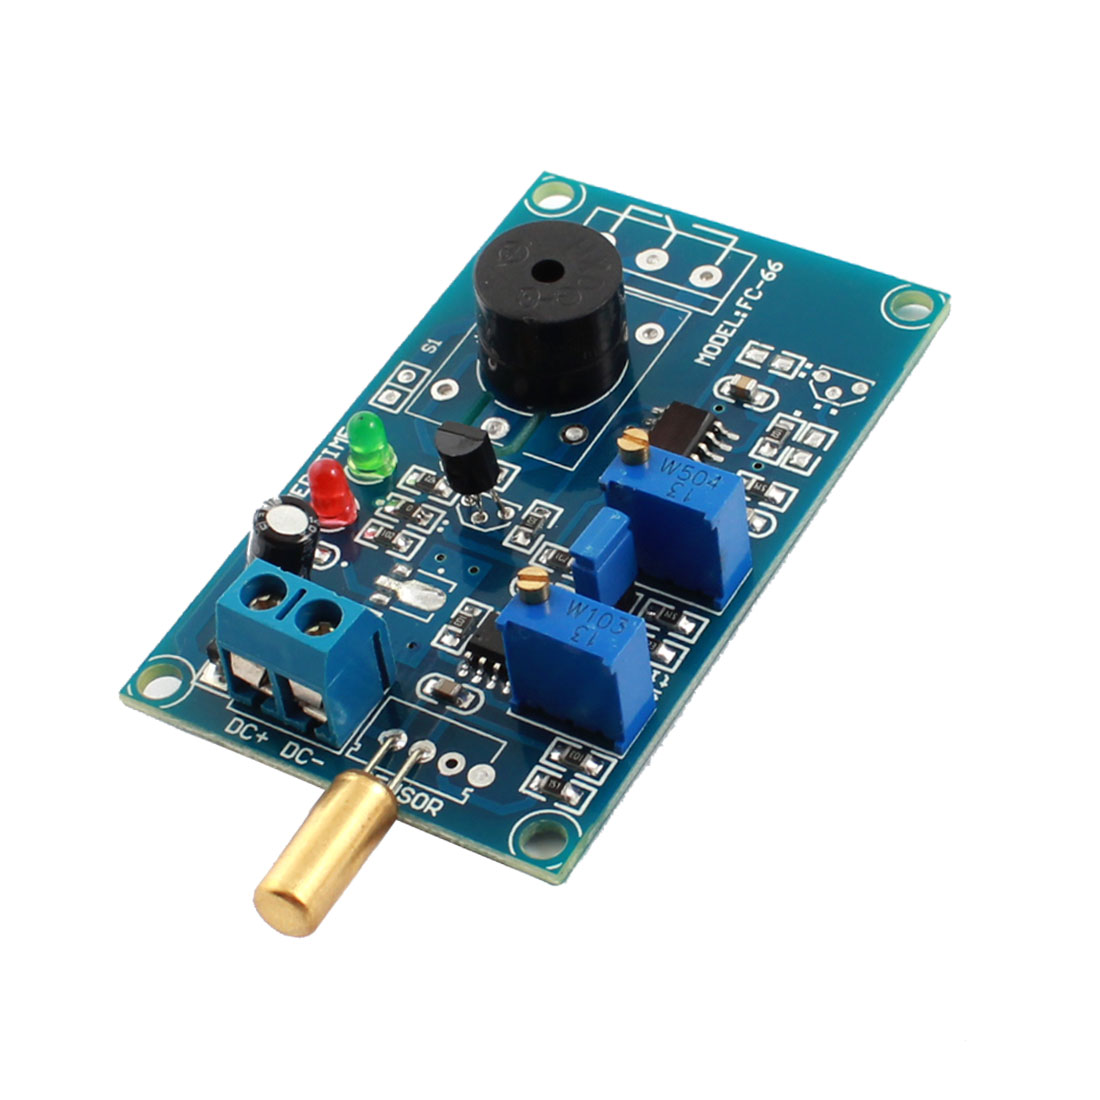 DC5V 0-20s Angular Transducer Dumping Angle Sensor Inclination Time Delay Alarm Buzzer Module